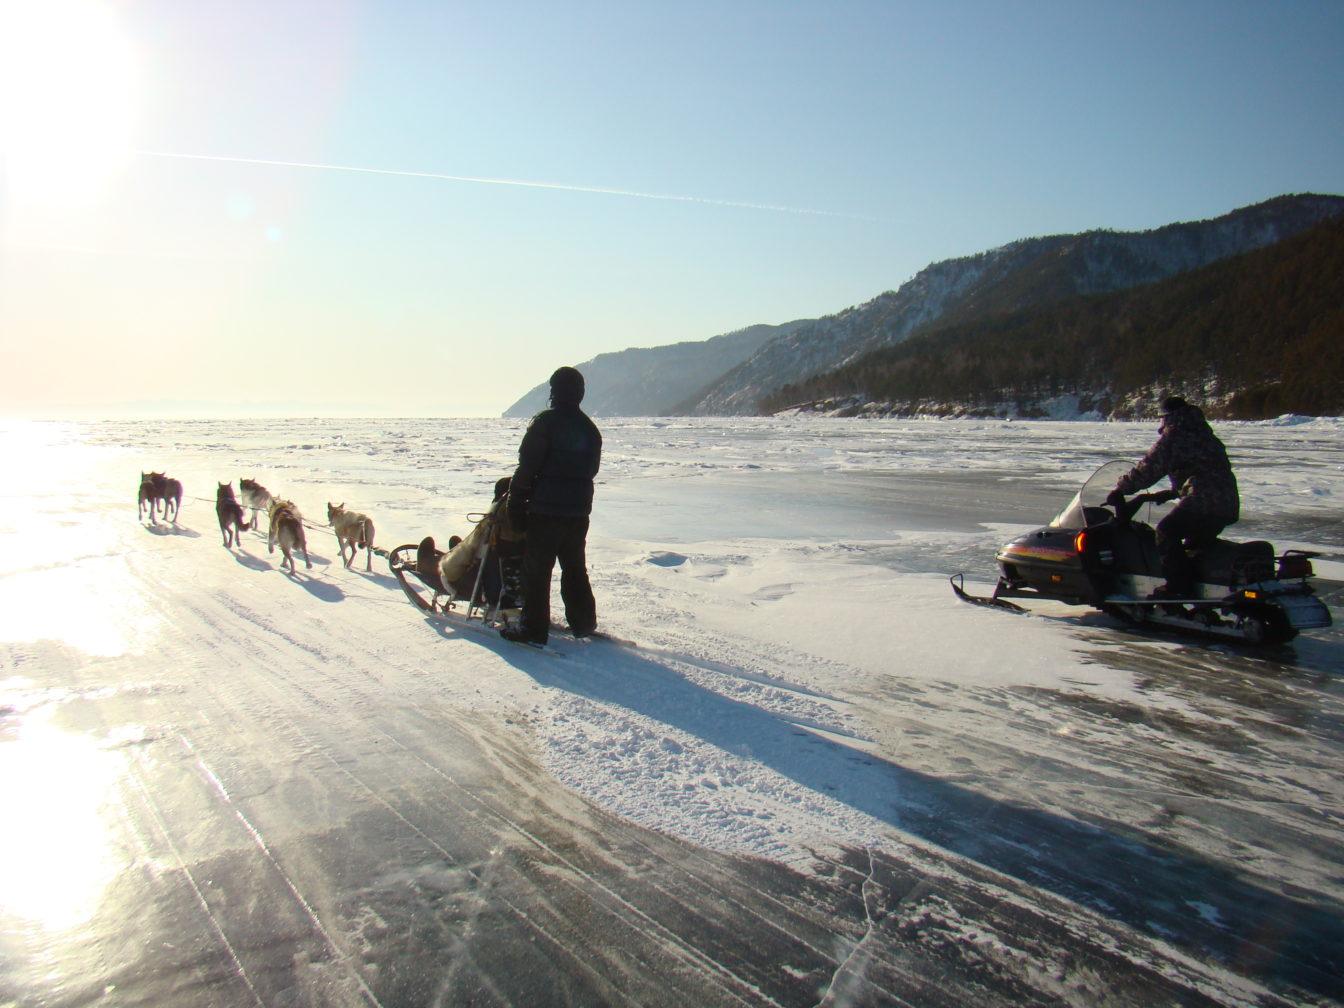 Dog sledding over ice at Lake Baikal.